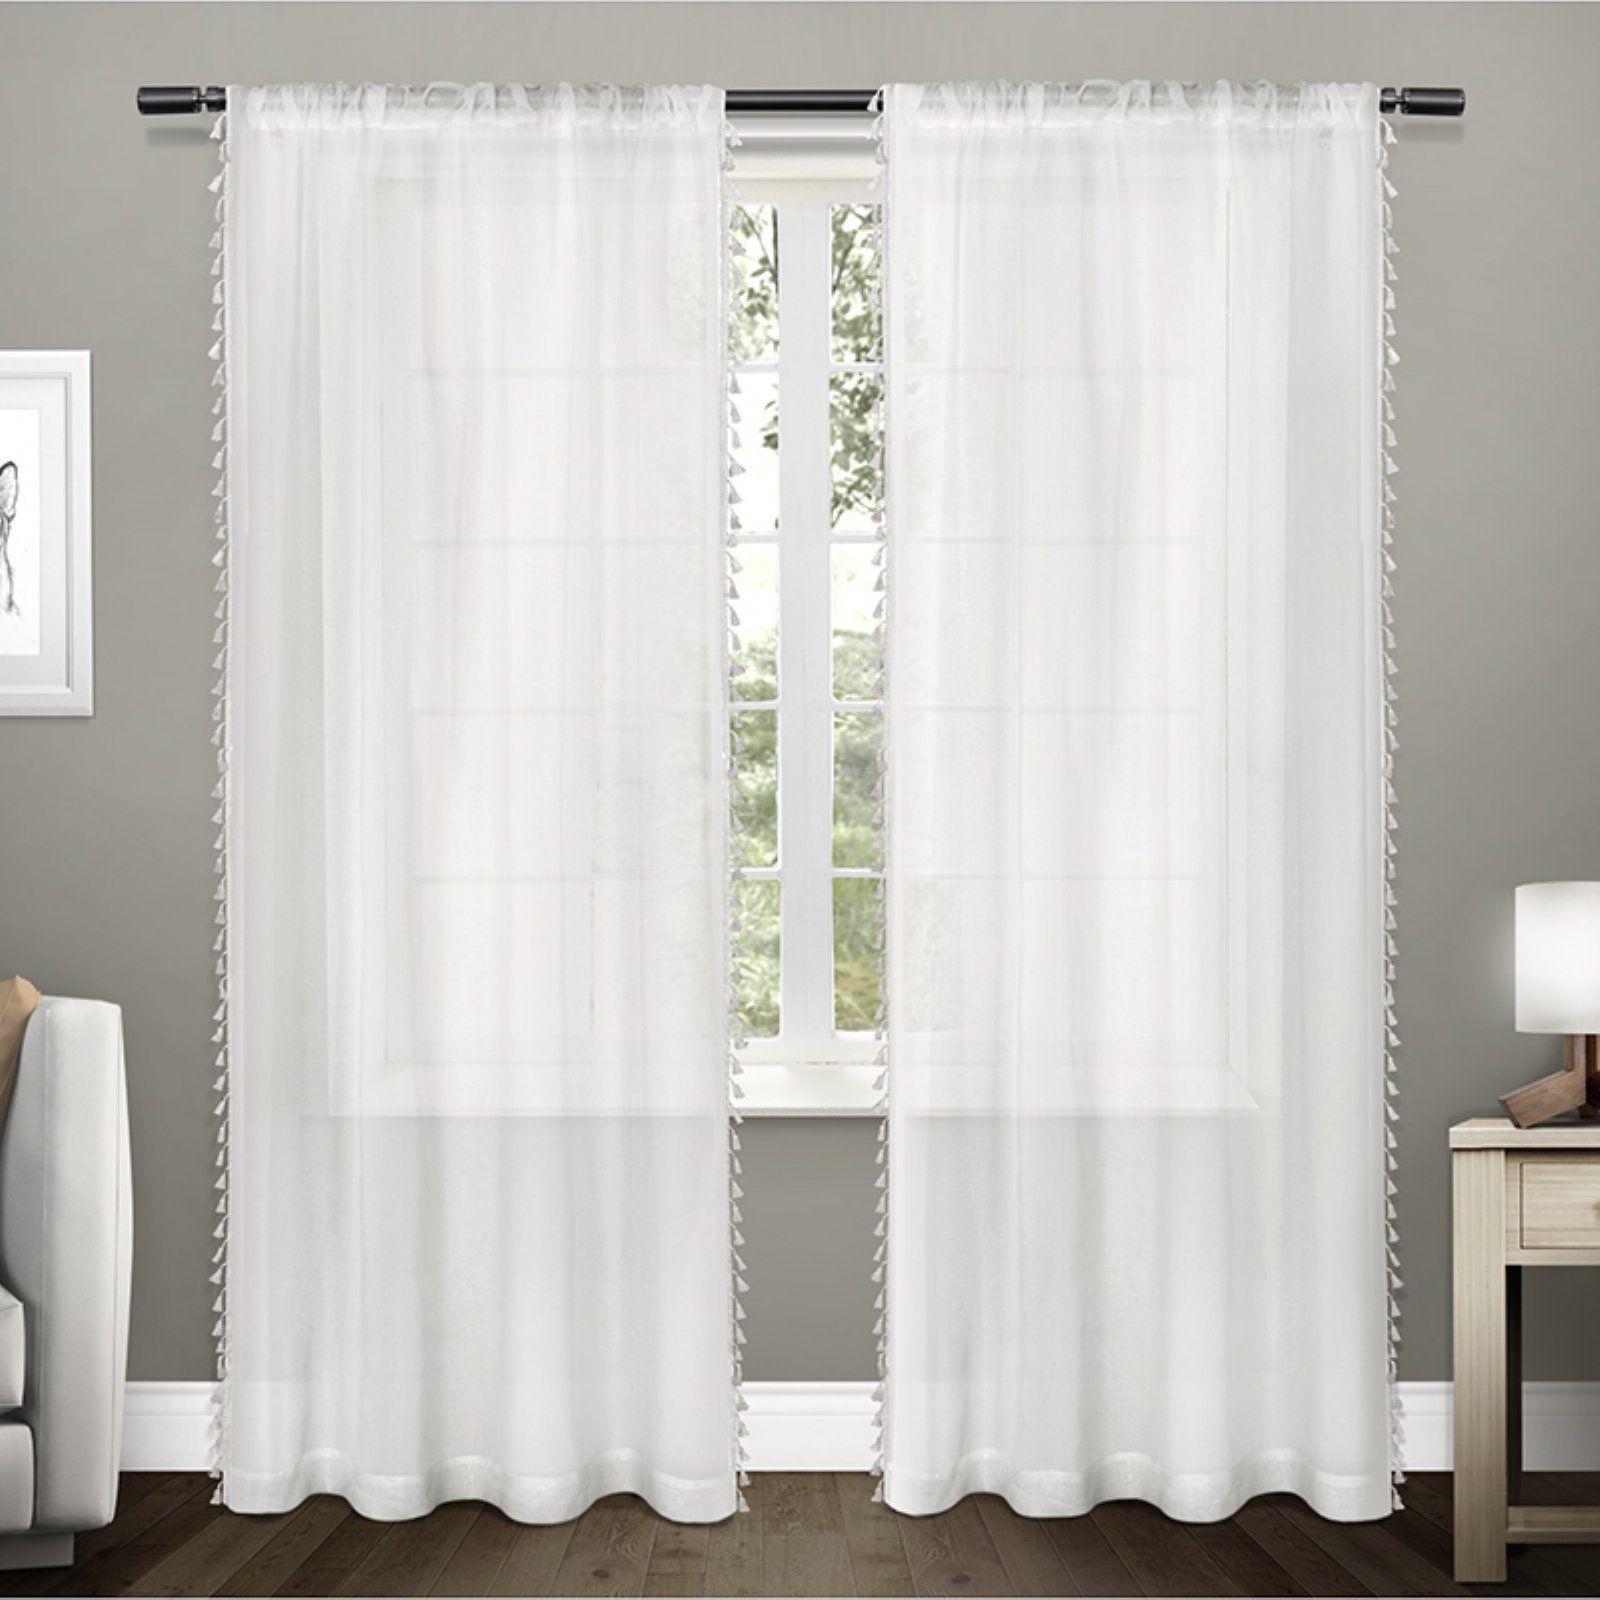 Exclusive Home Tassels Textured Sheer Curtain Panel Pair Seafoam